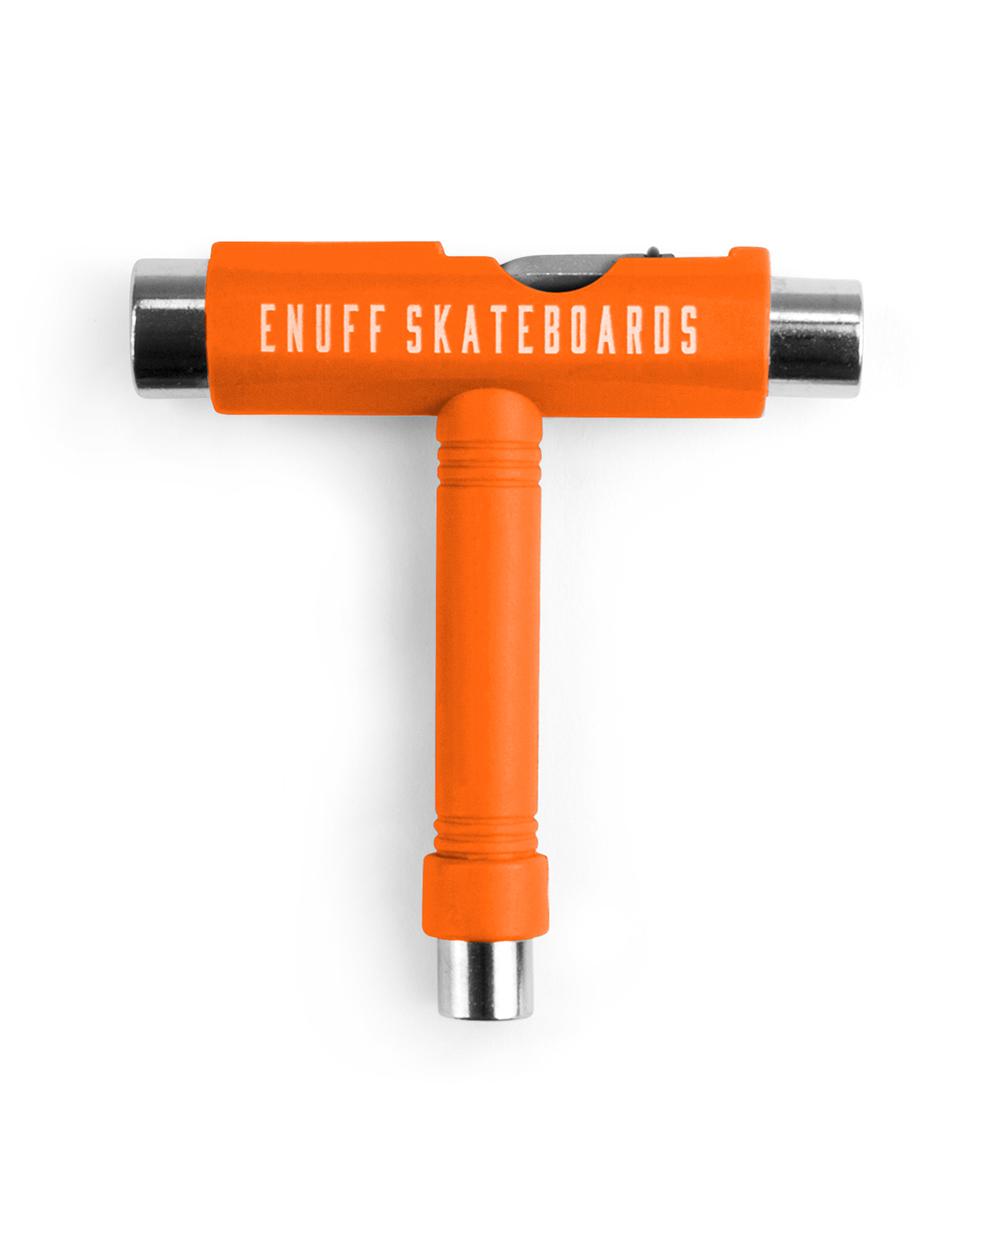 Enuff Herramienta para Skateboard Essential Tool Orange